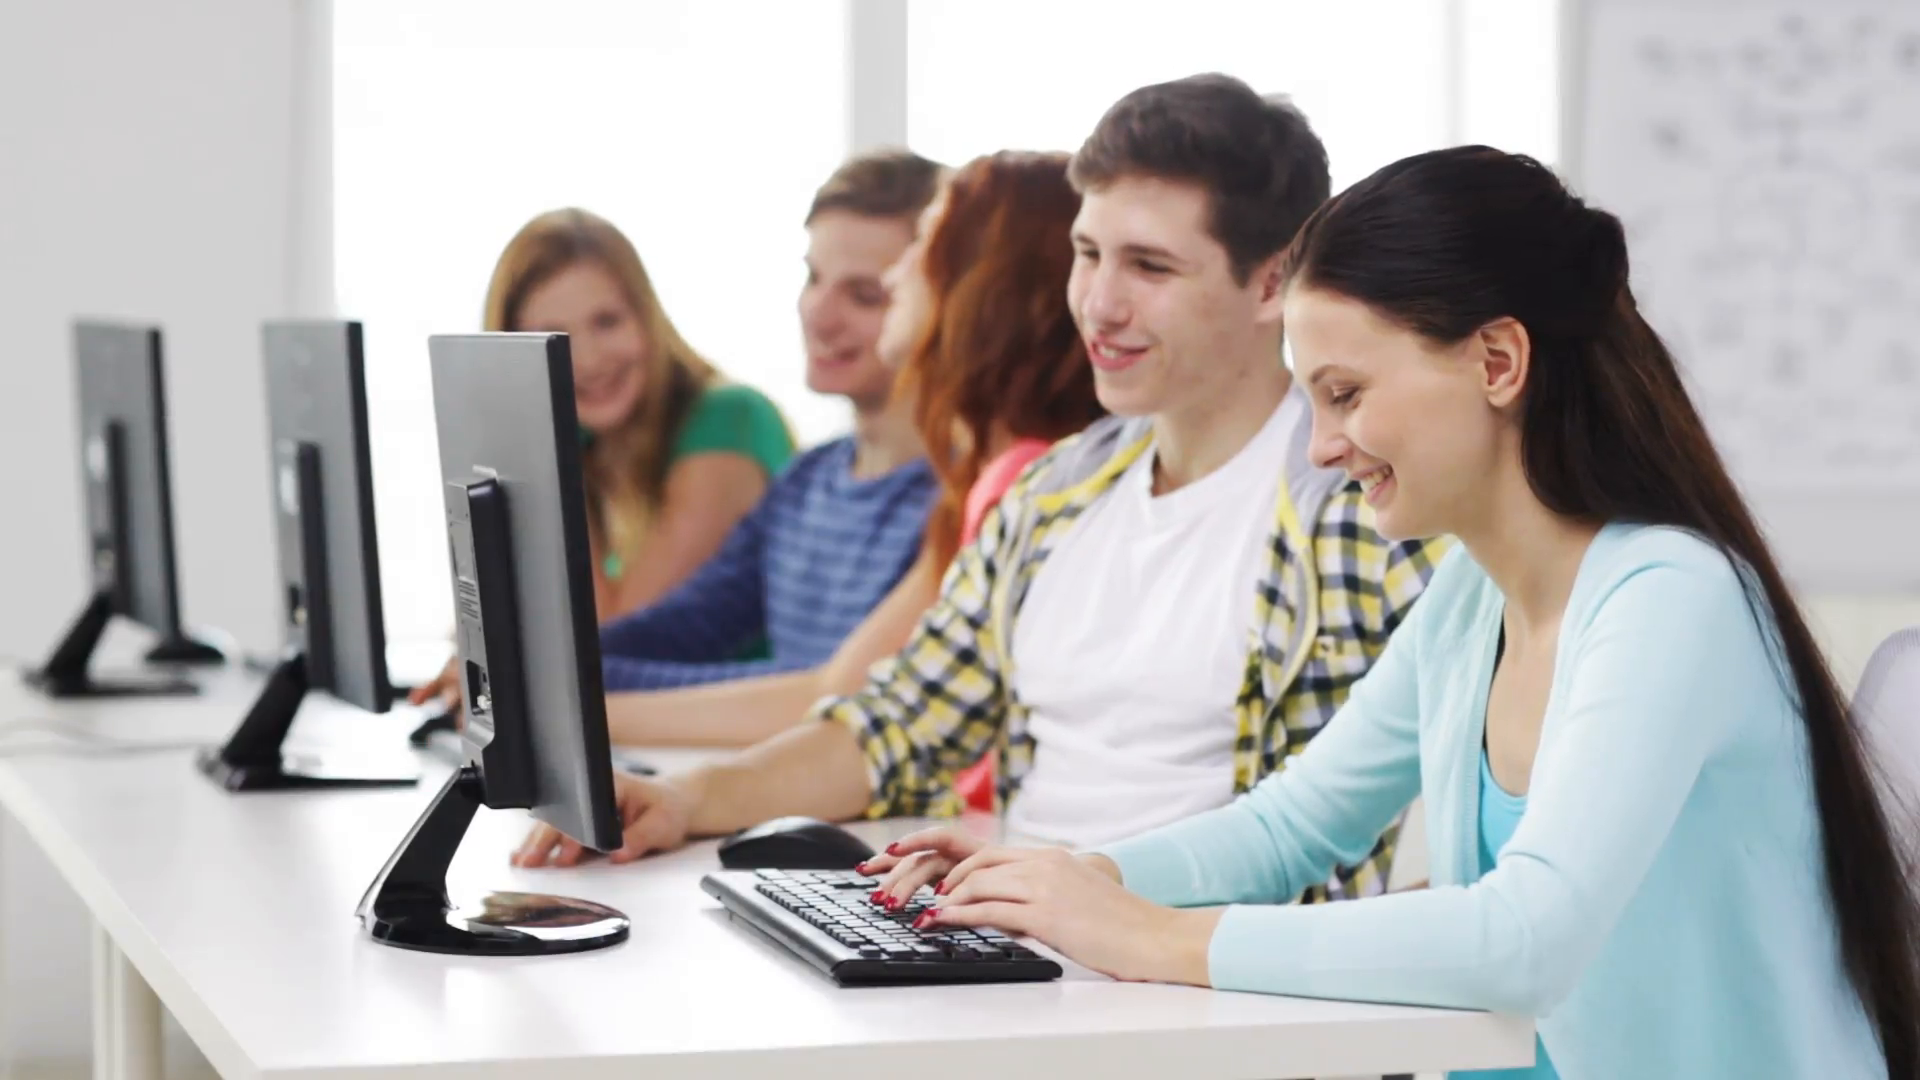 education-technology